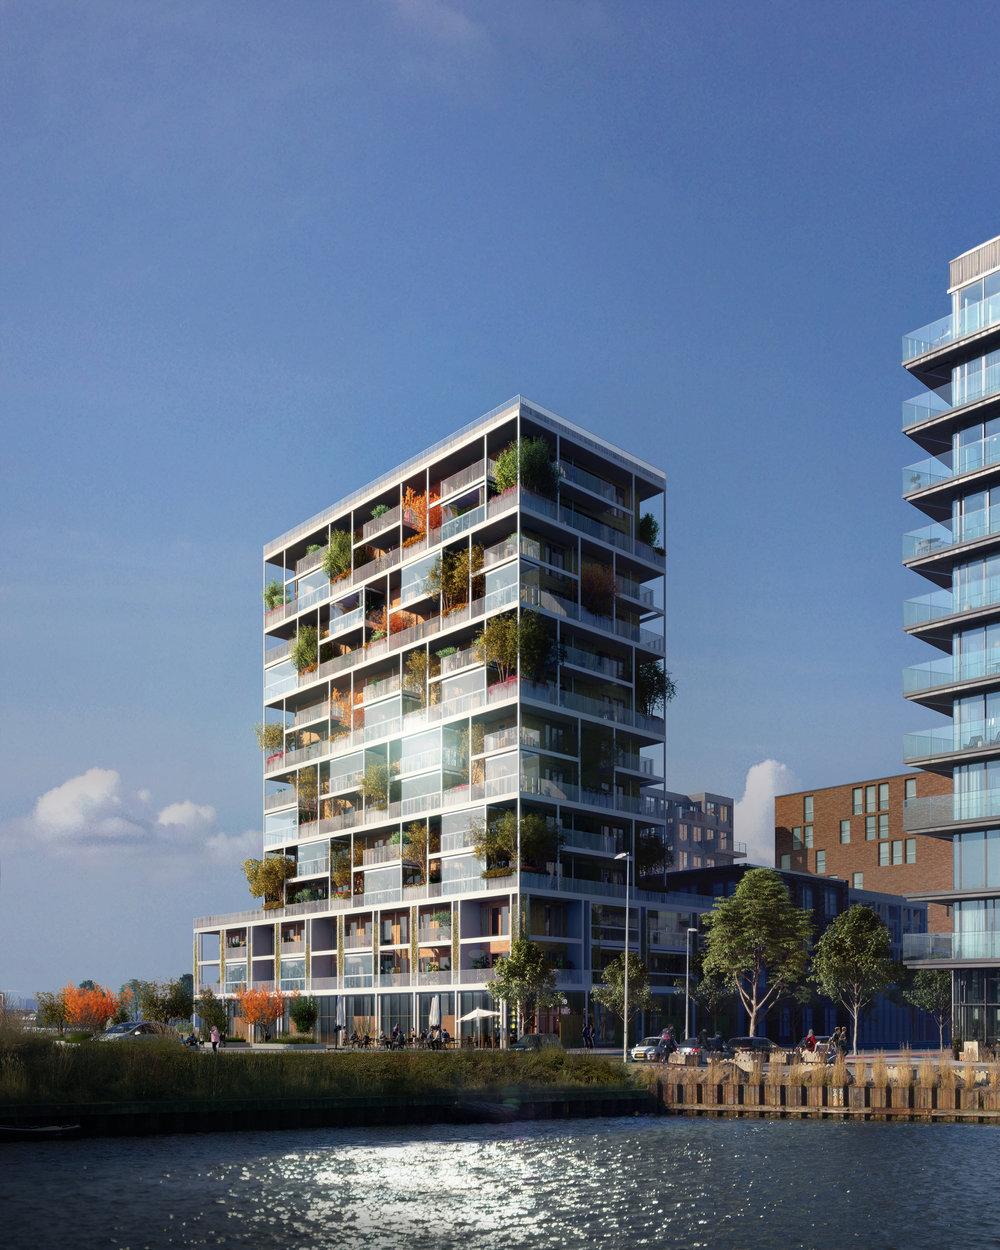 Stories - Appartementen Buiksloterham, Amsterdam